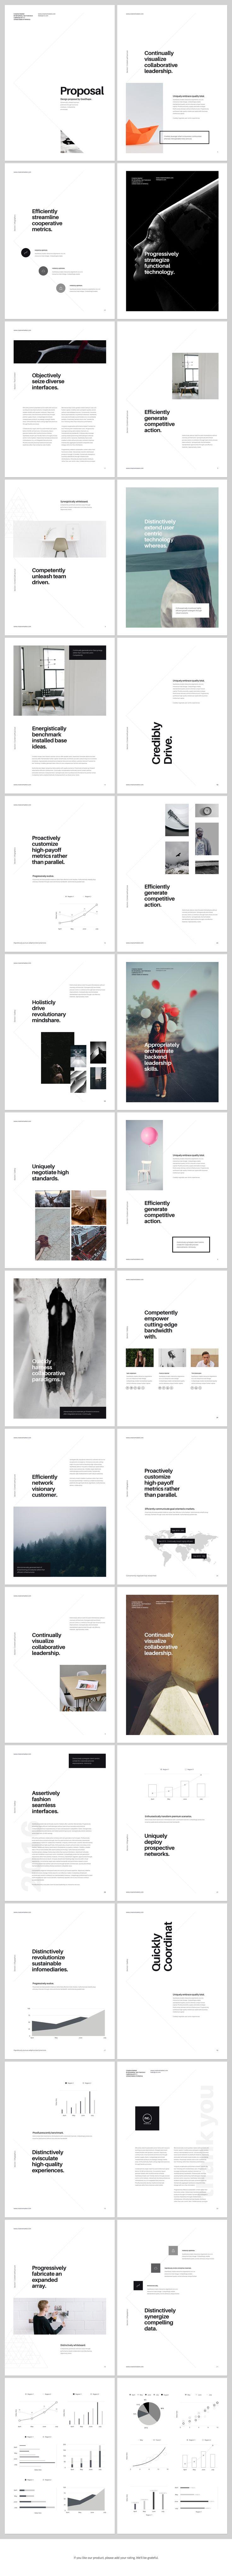 A4 Keynote Presentation for Print by GoaShape on @Creative Market